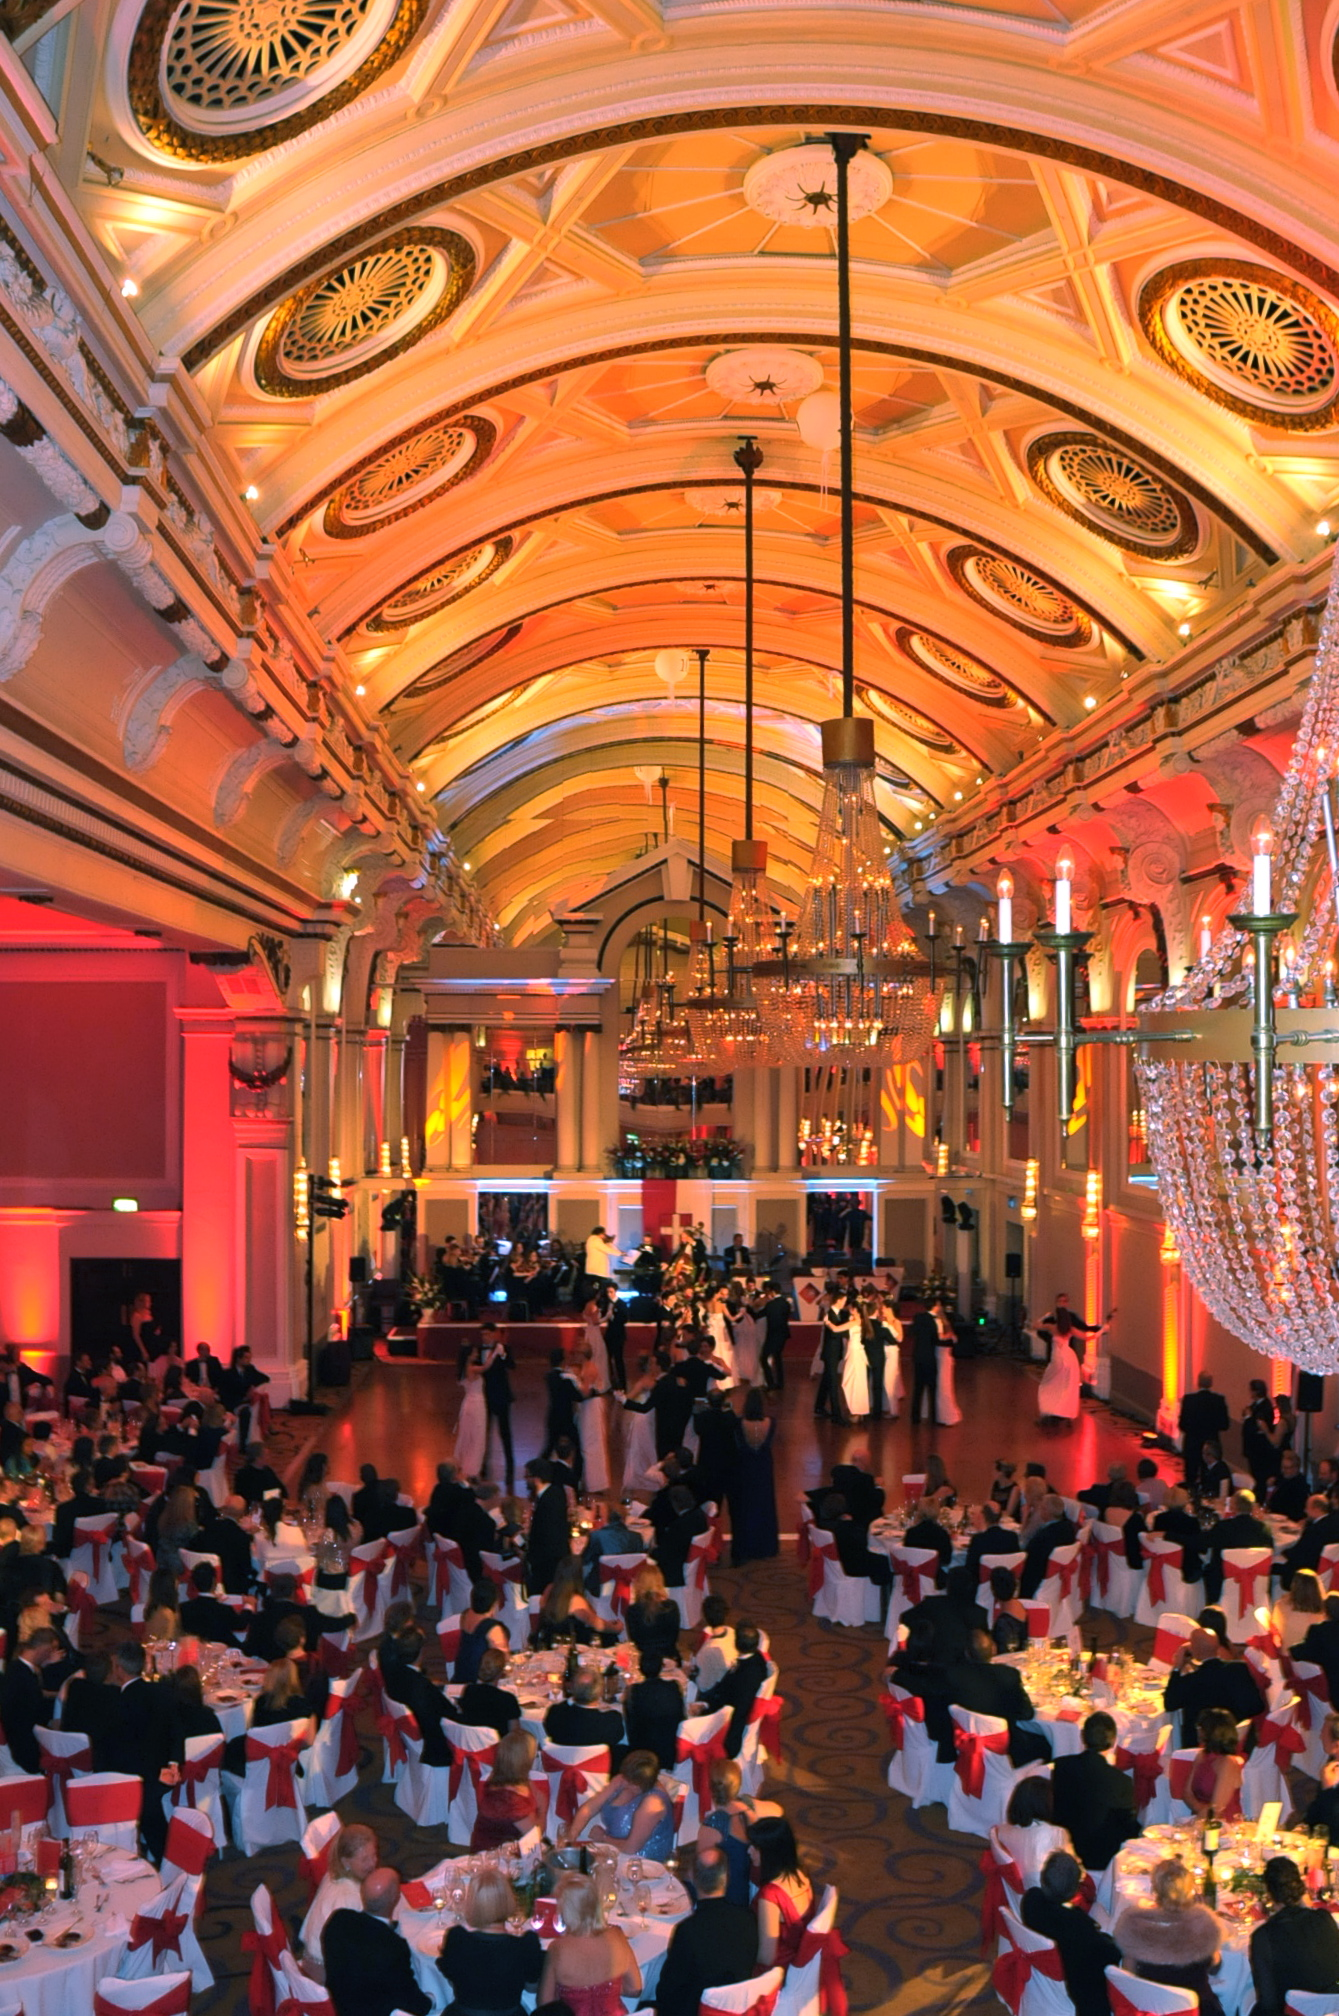 17 января будет дан Зимний Русский Бал в зале Grand Connaught Rooms.